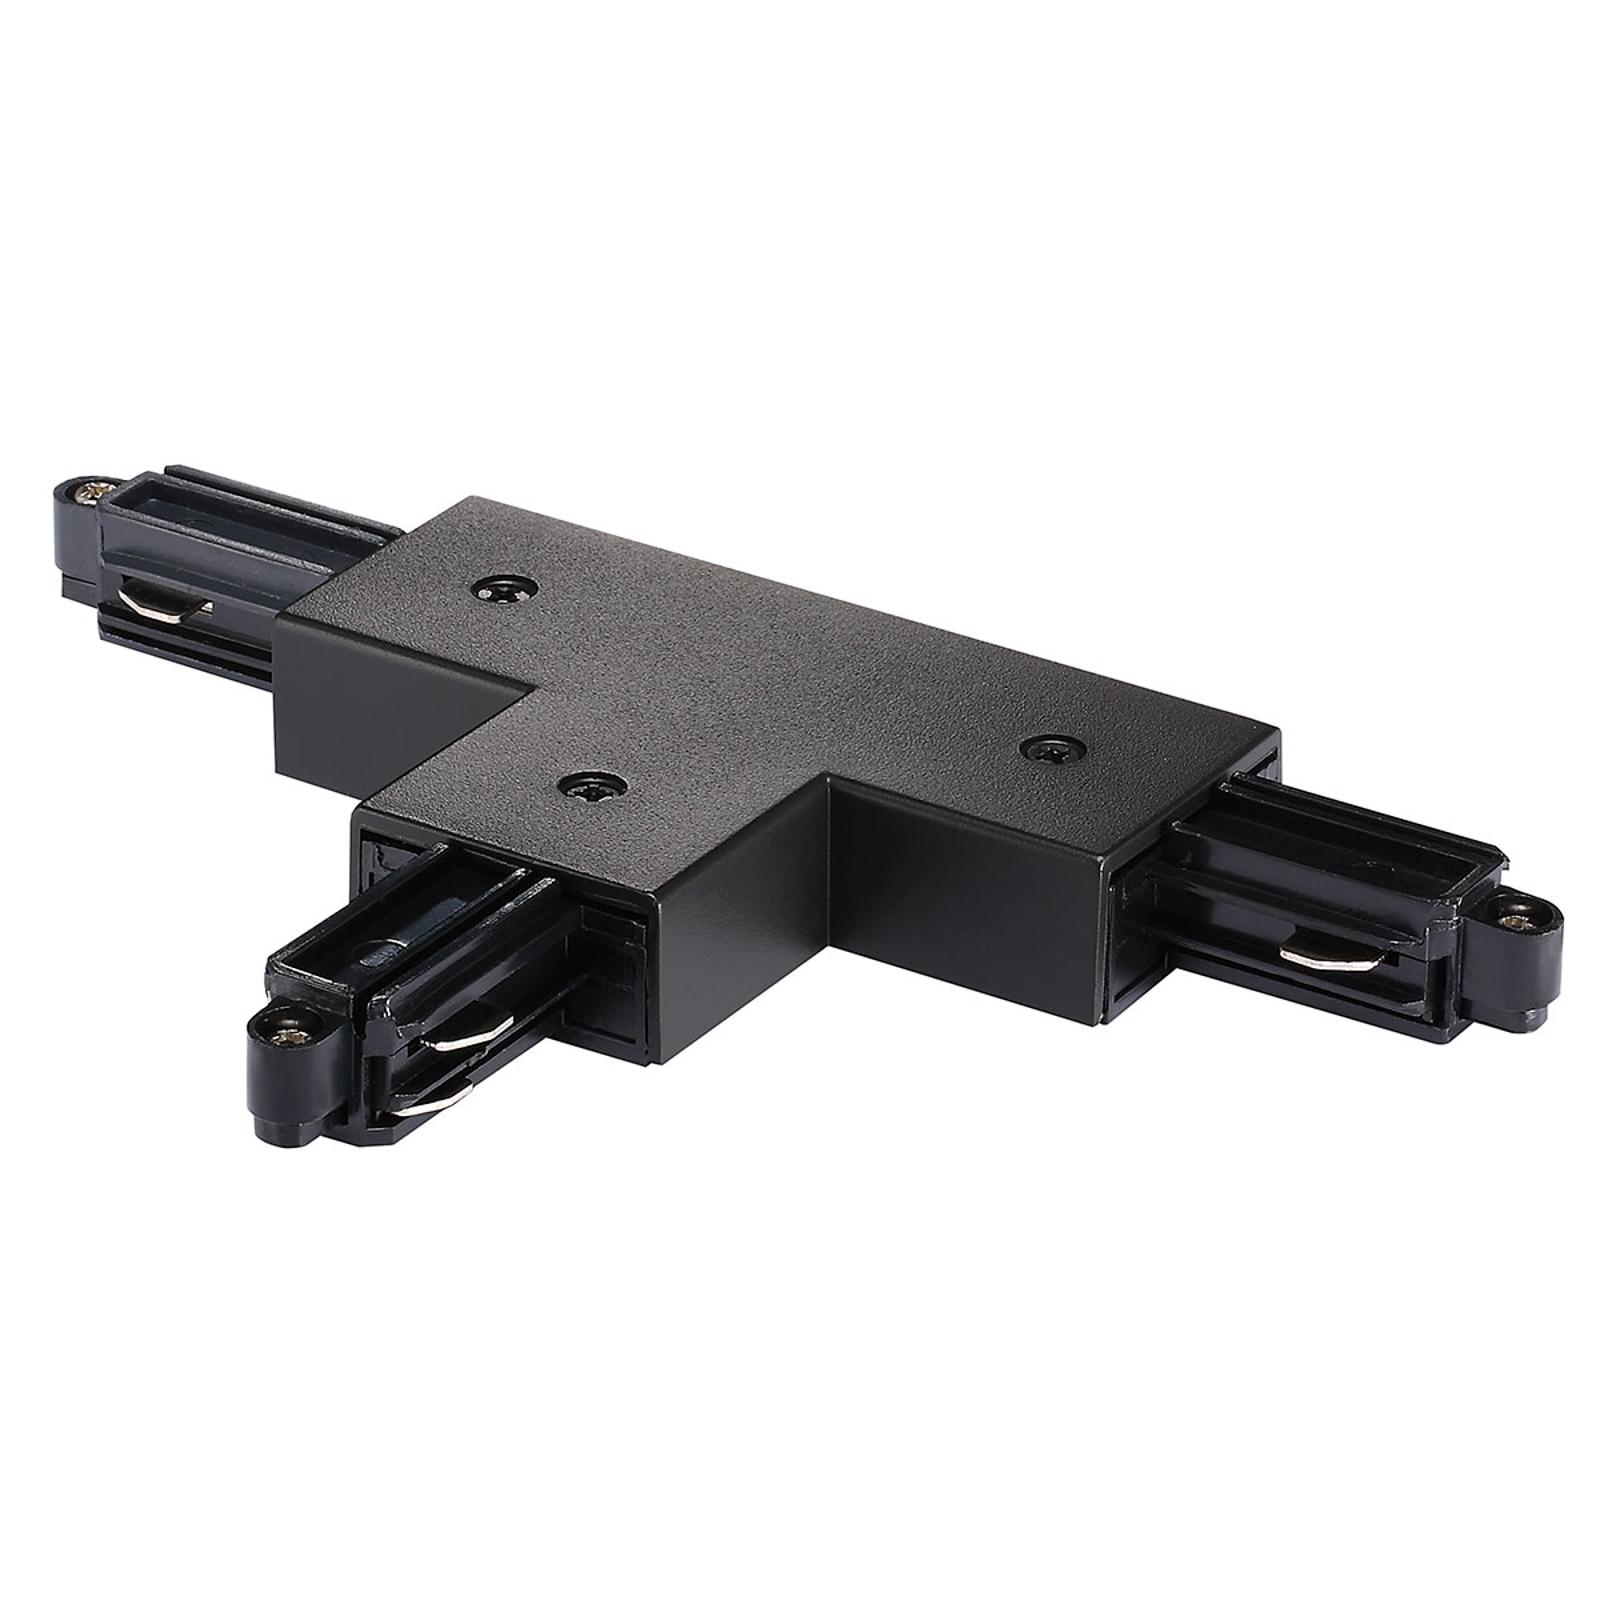 T-kontakt for strømskinne Link, venstre, svart